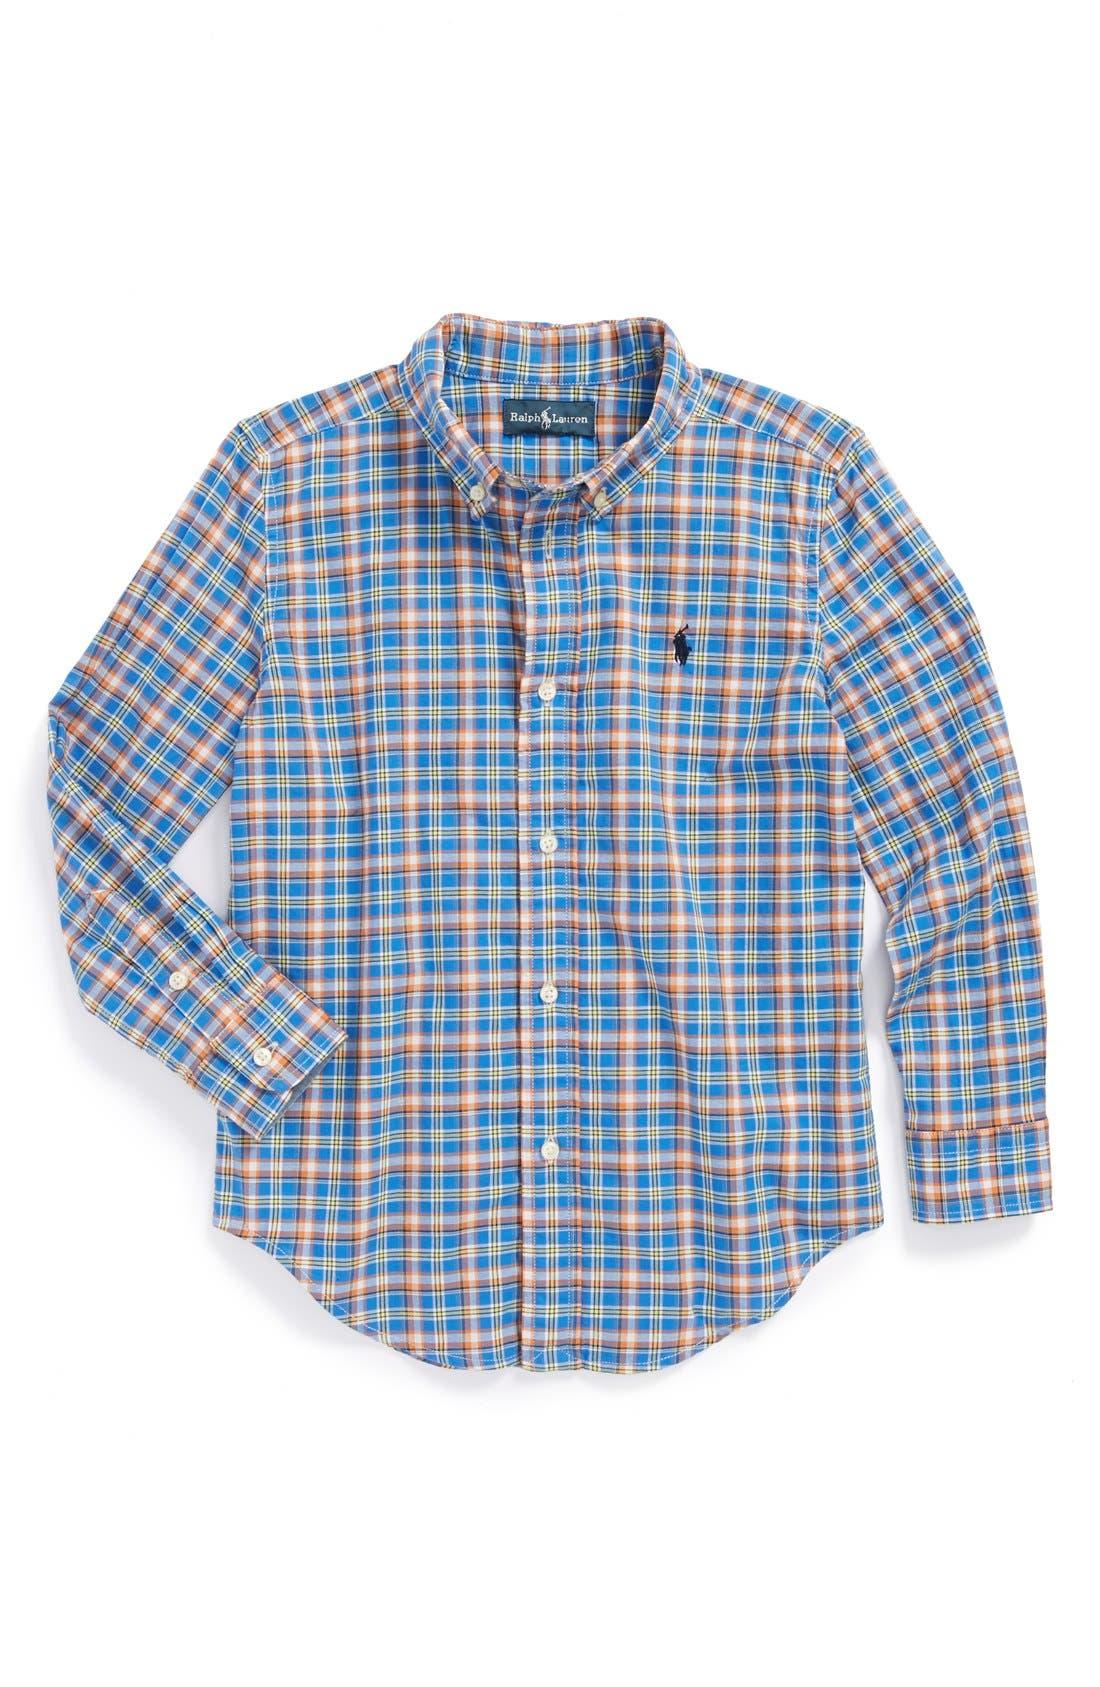 Alternate Image 1 Selected - Ralph Lauren Plaid Shirt (Toddler Boys)